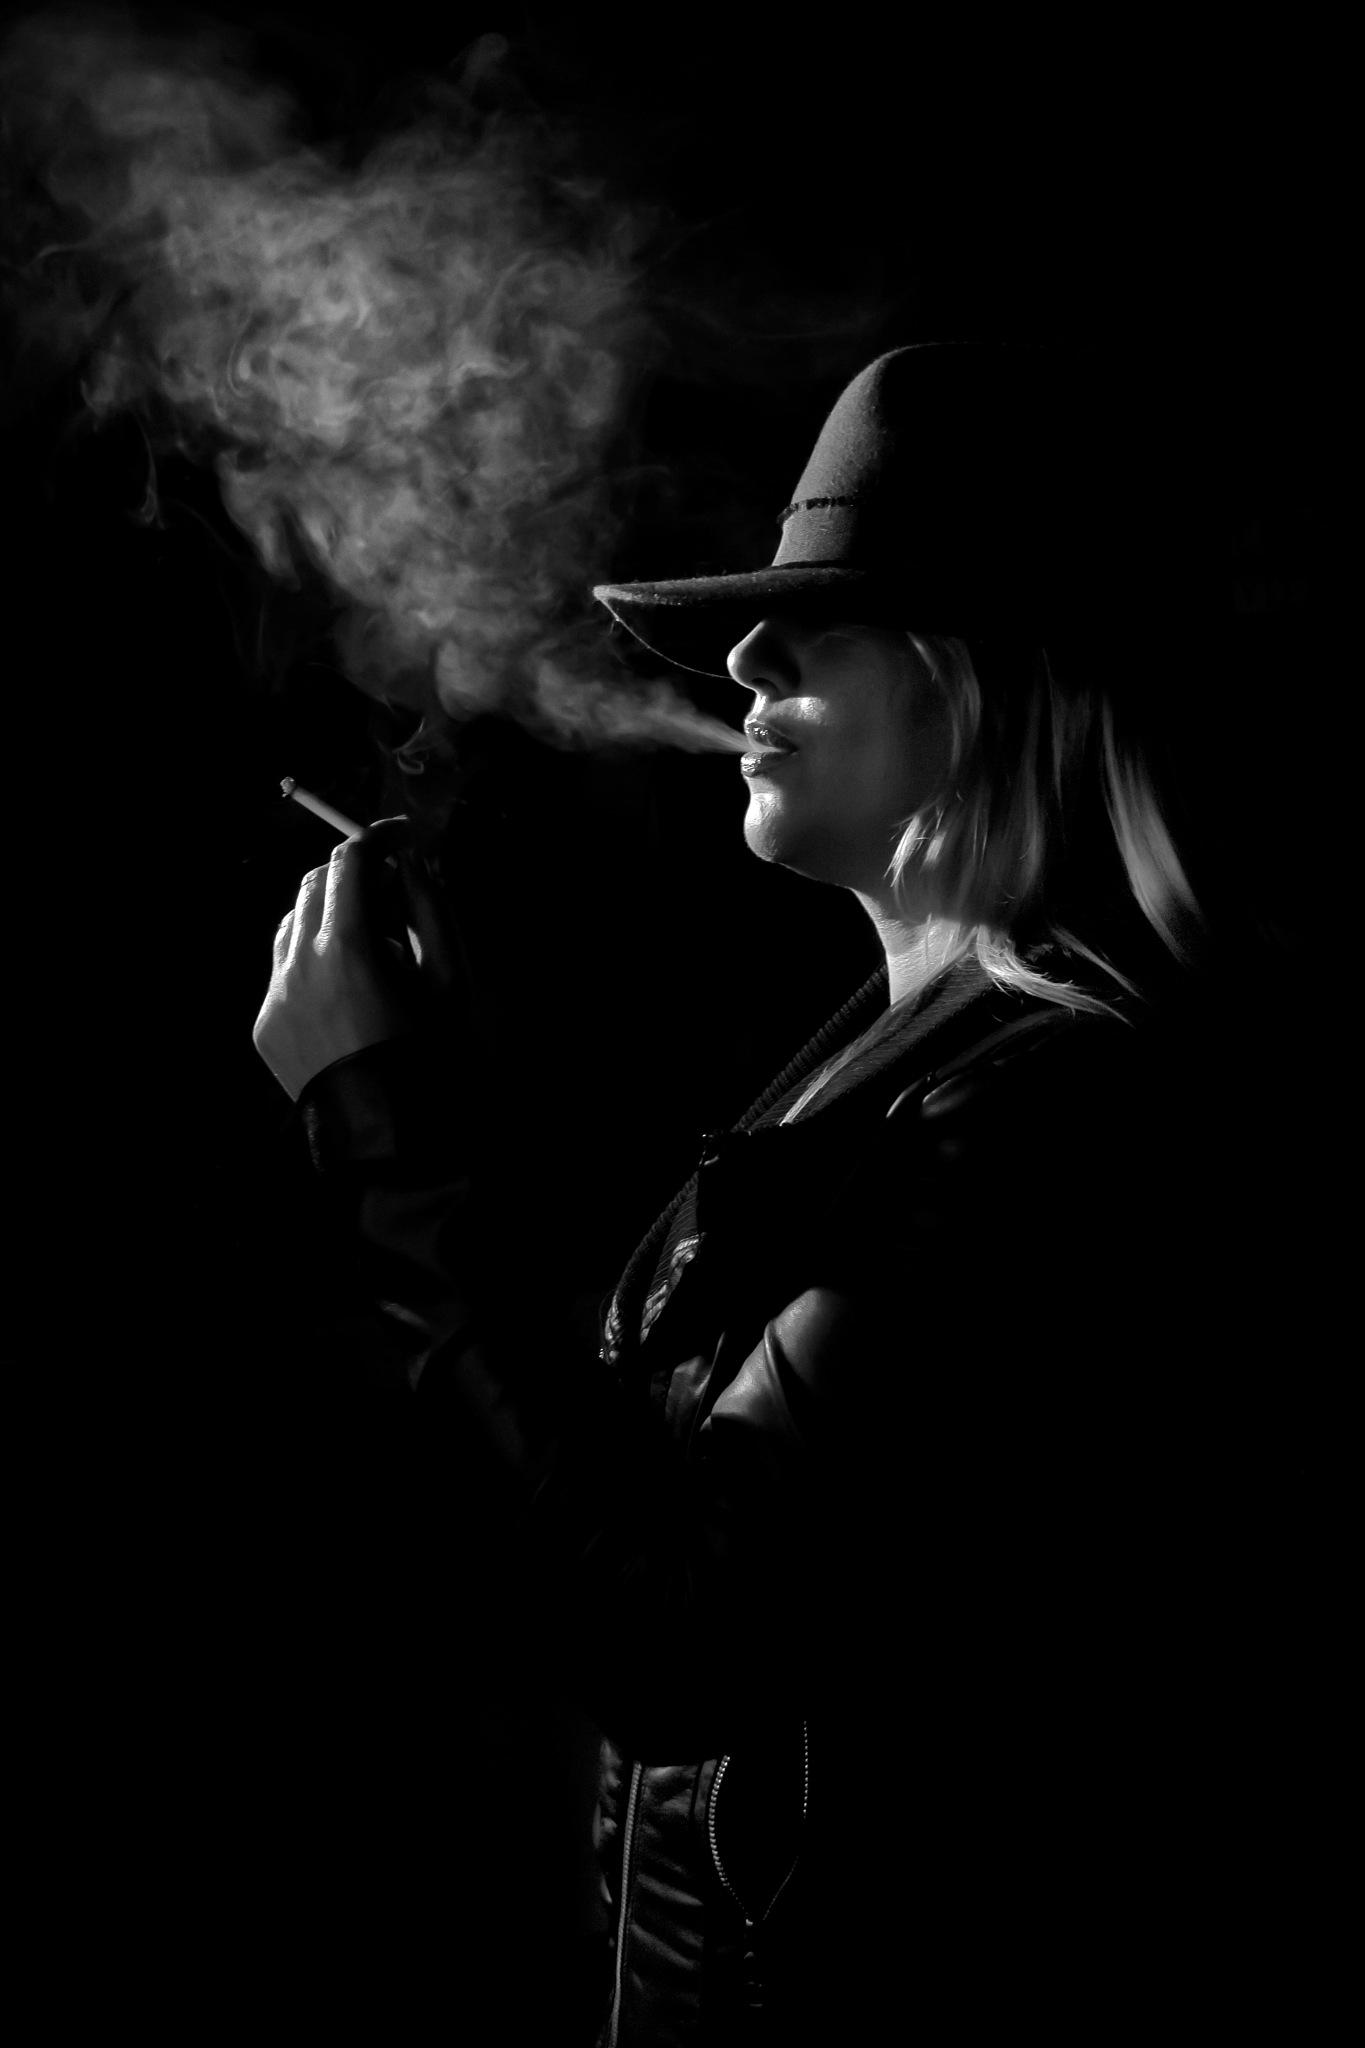 Smoking by Koula Komodromou Hadjichrysanthou